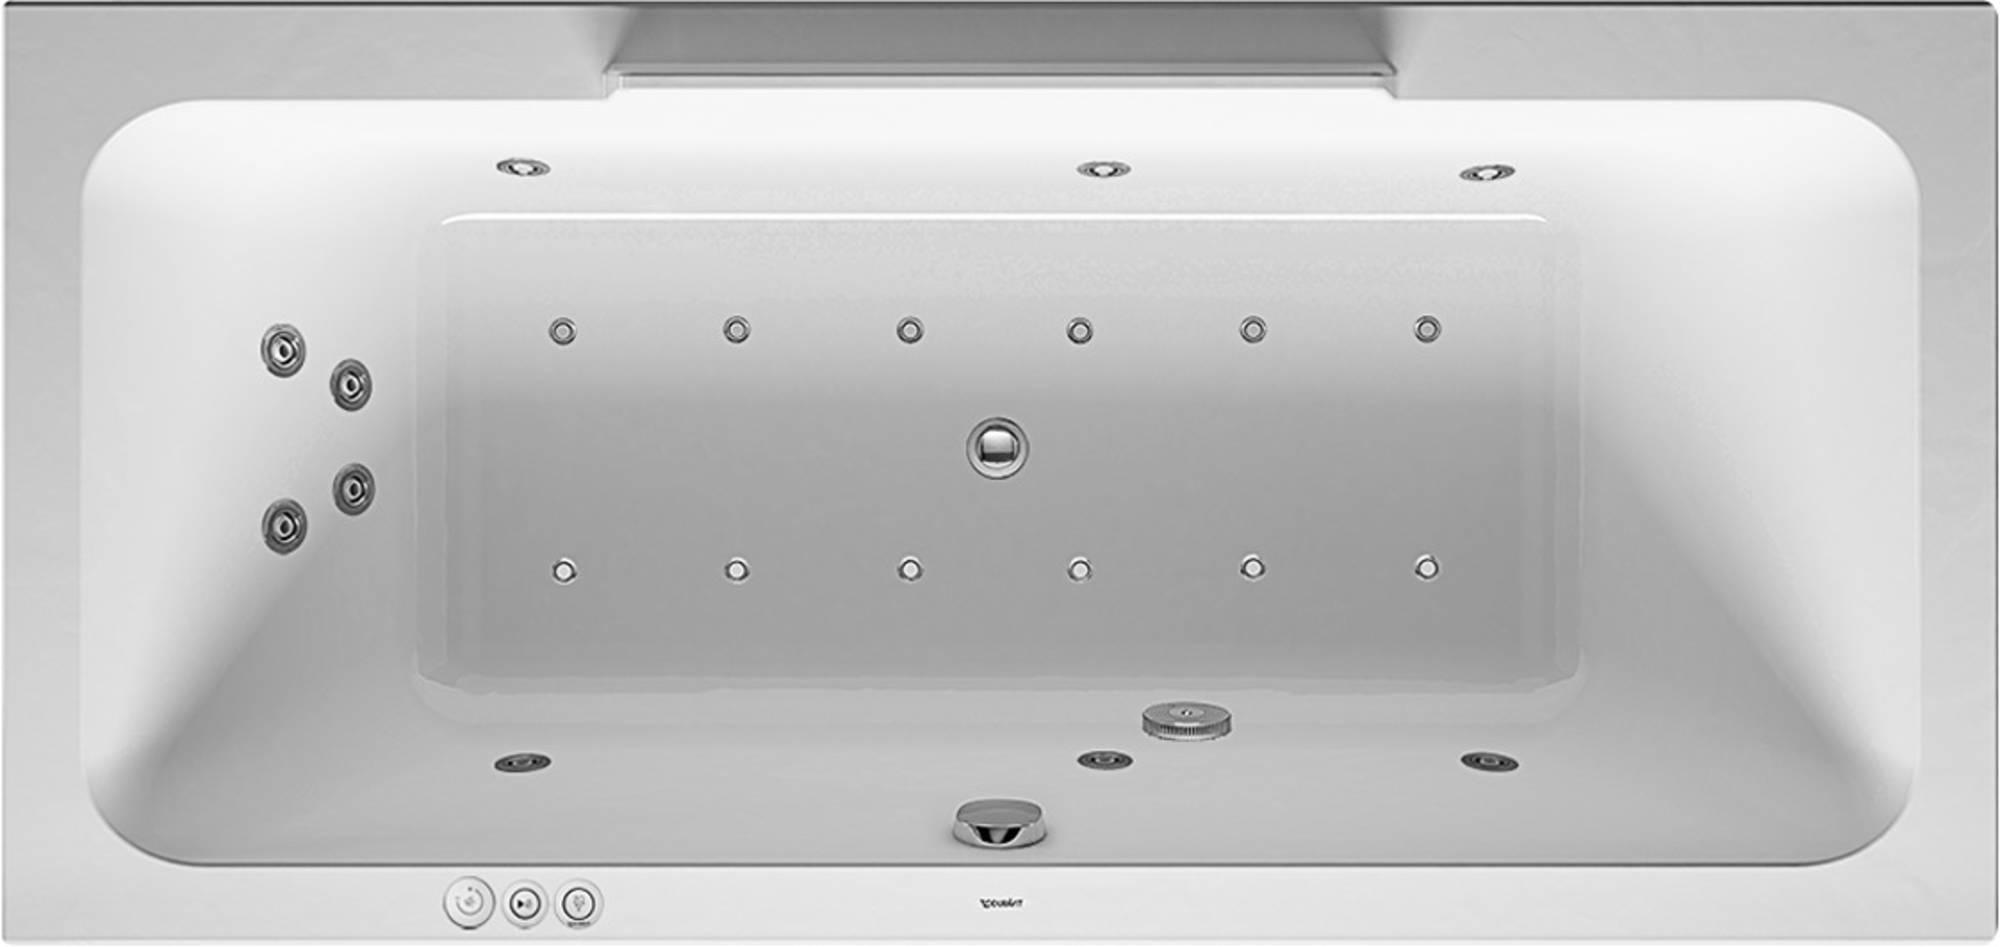 Duravit DuraStyle Systeembad 250 liter Acryl 190x90 cm Wit